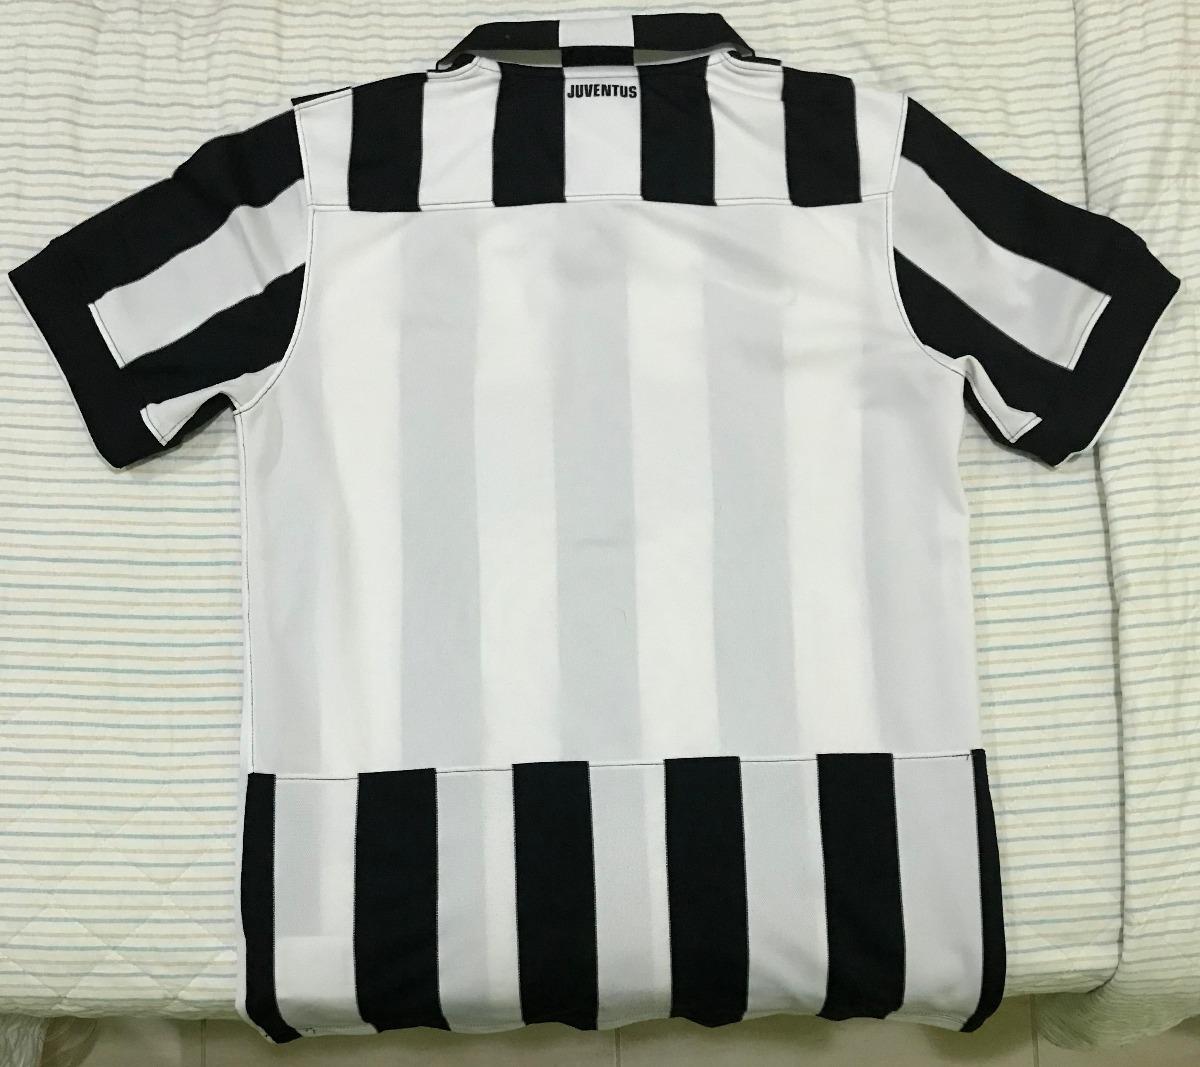 Camisa Juventus De Turim - 2014-2015 eecff07df92dc